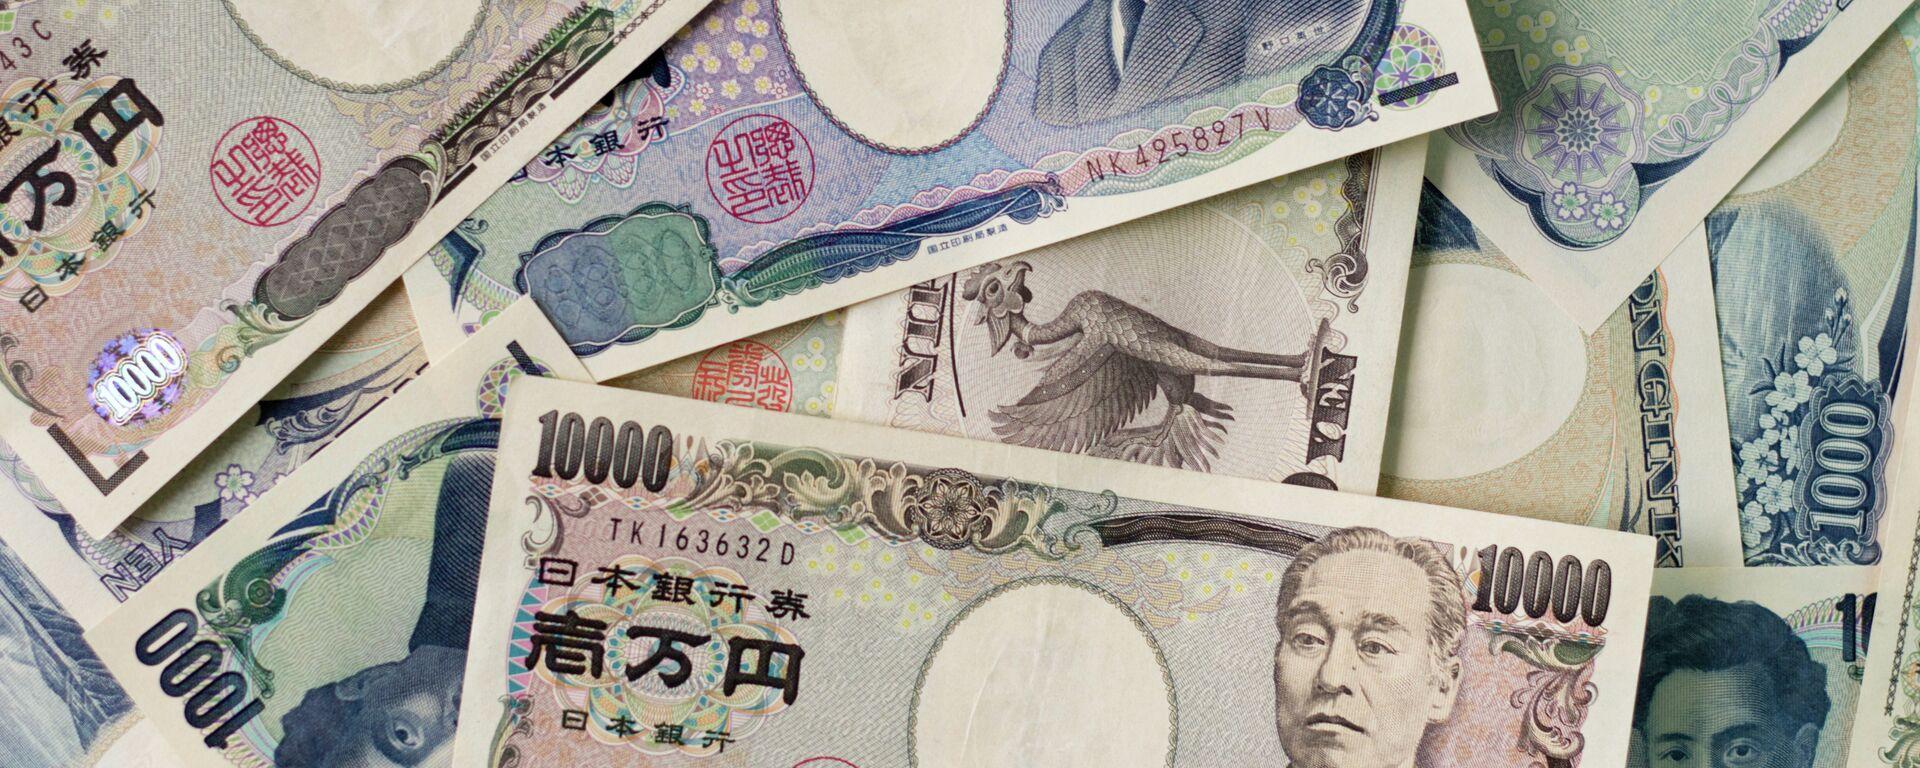 1000 yen bills and 10,000 yen bills spread out on a table. - Sputnik Italia, 1920, 25.05.2021